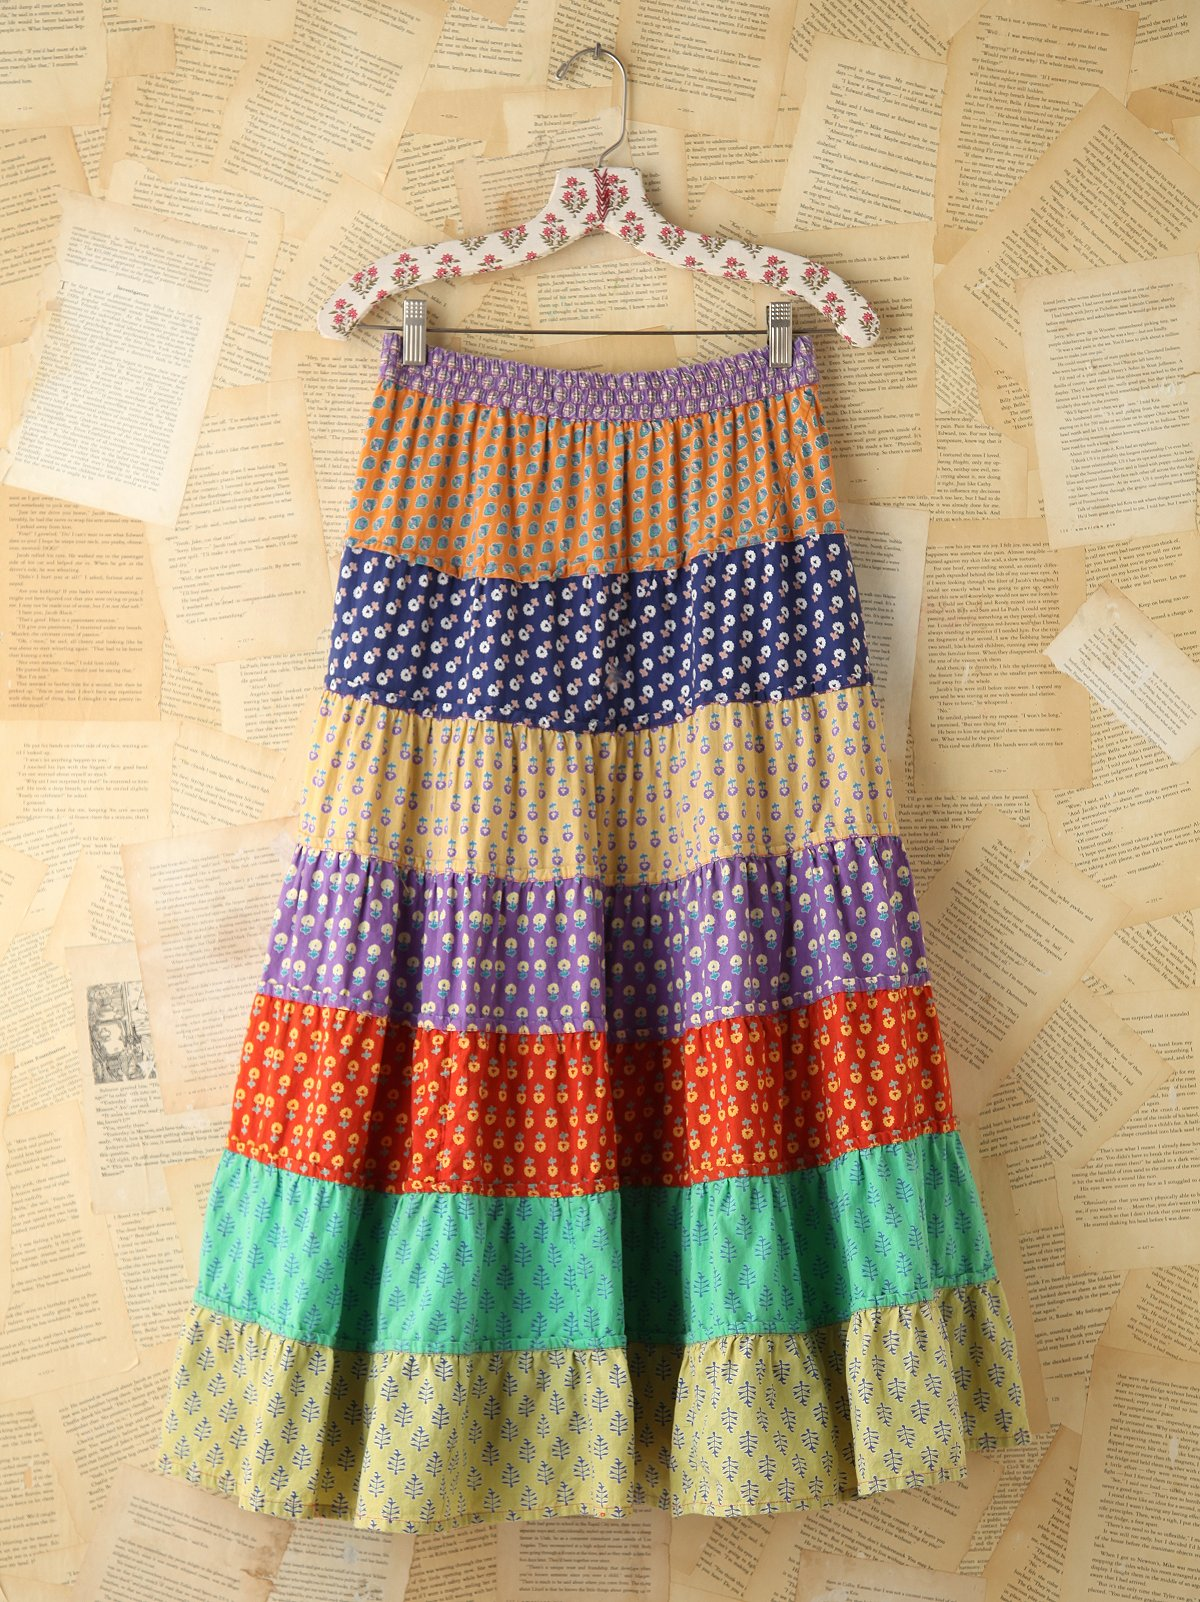 Vintage Colorful Printed Tiered Skirt